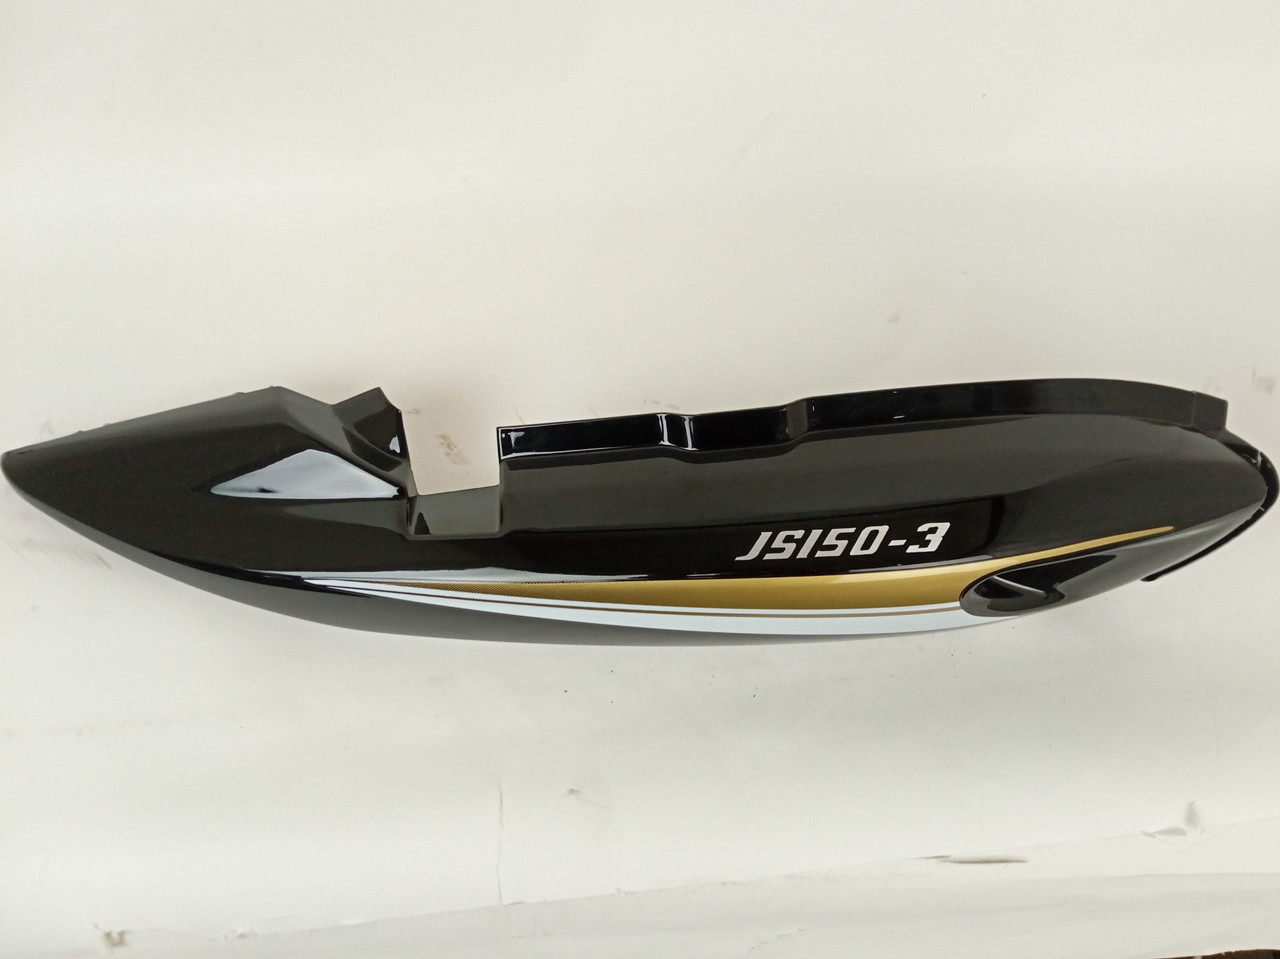 JS150-3 R6 Пластик боковой задний ПРАВЫЙ Jianshe - CF0-006000-0-0T0B07